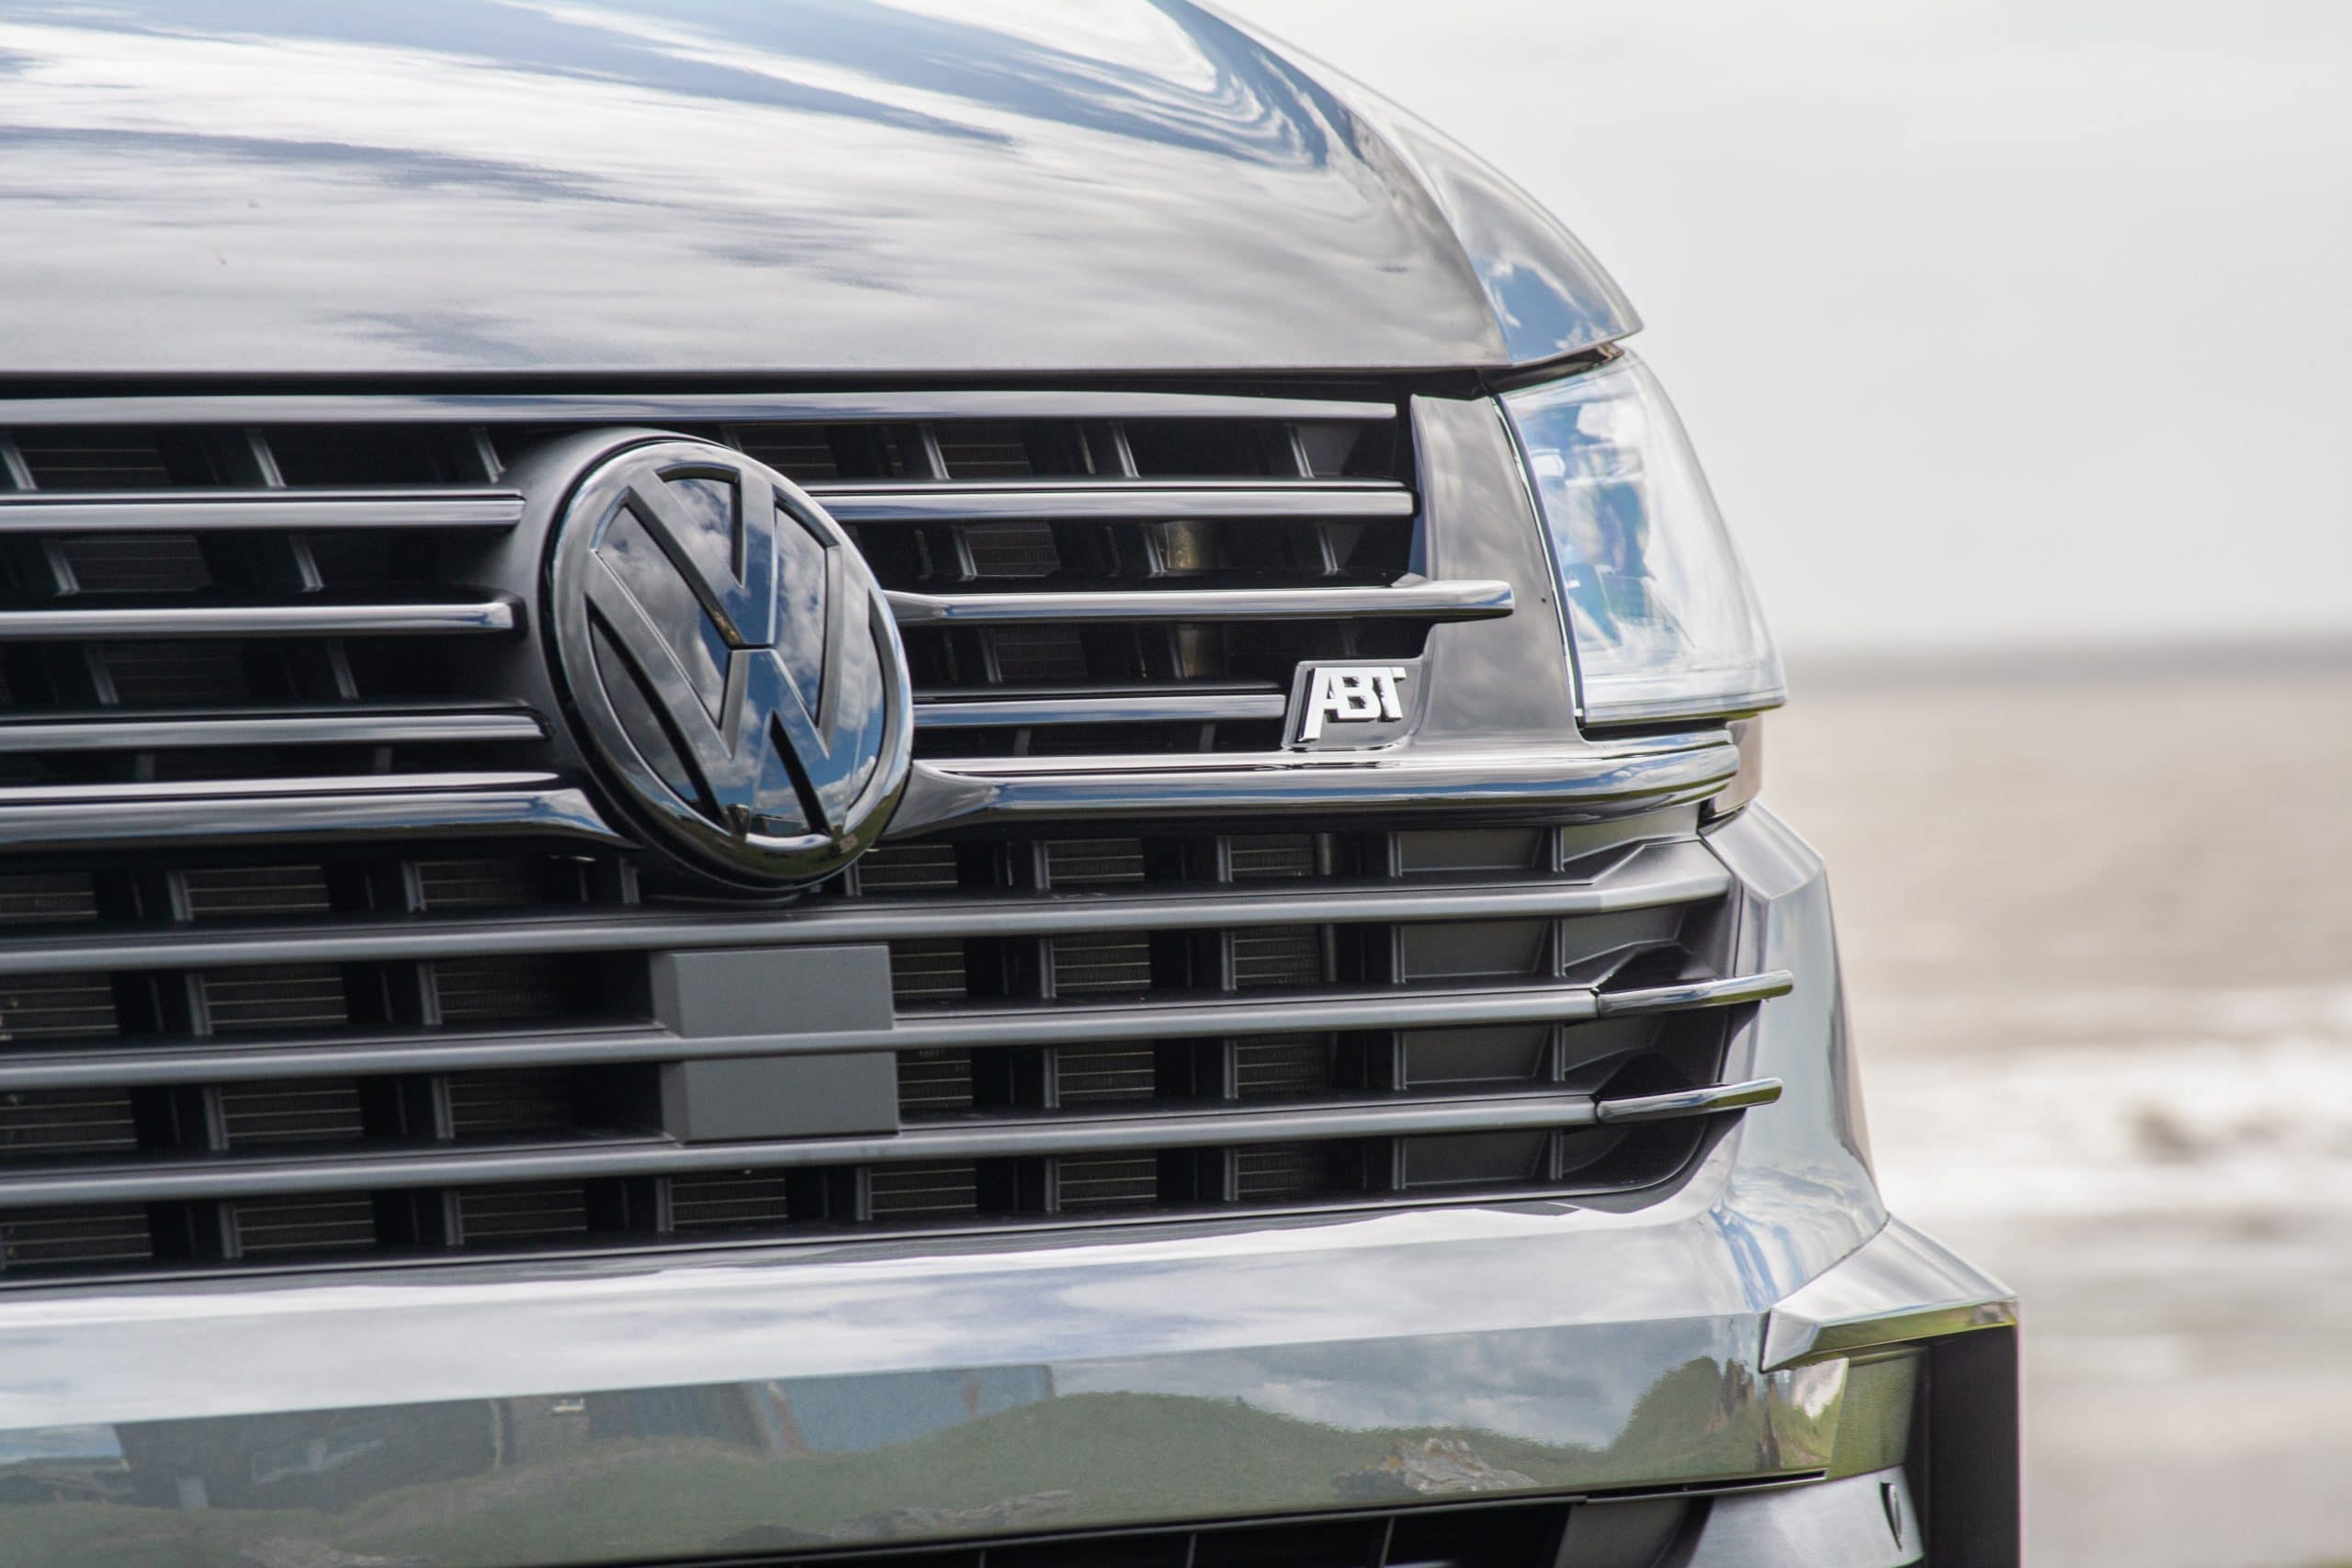 VW Transporter ABT Badge